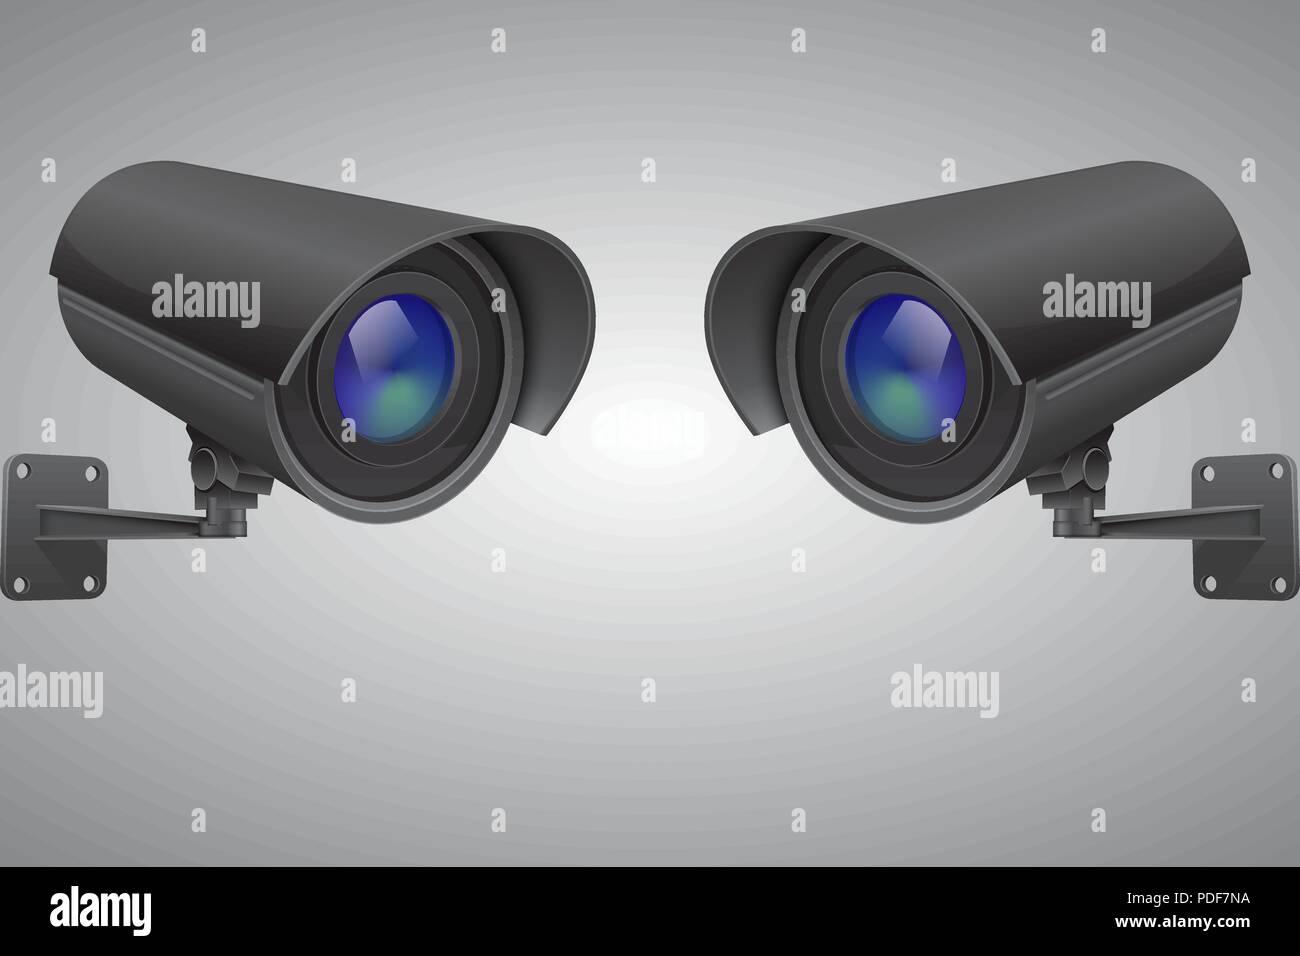 Security cameras. Black CCTV surveillance system on gray background - Stock Vector